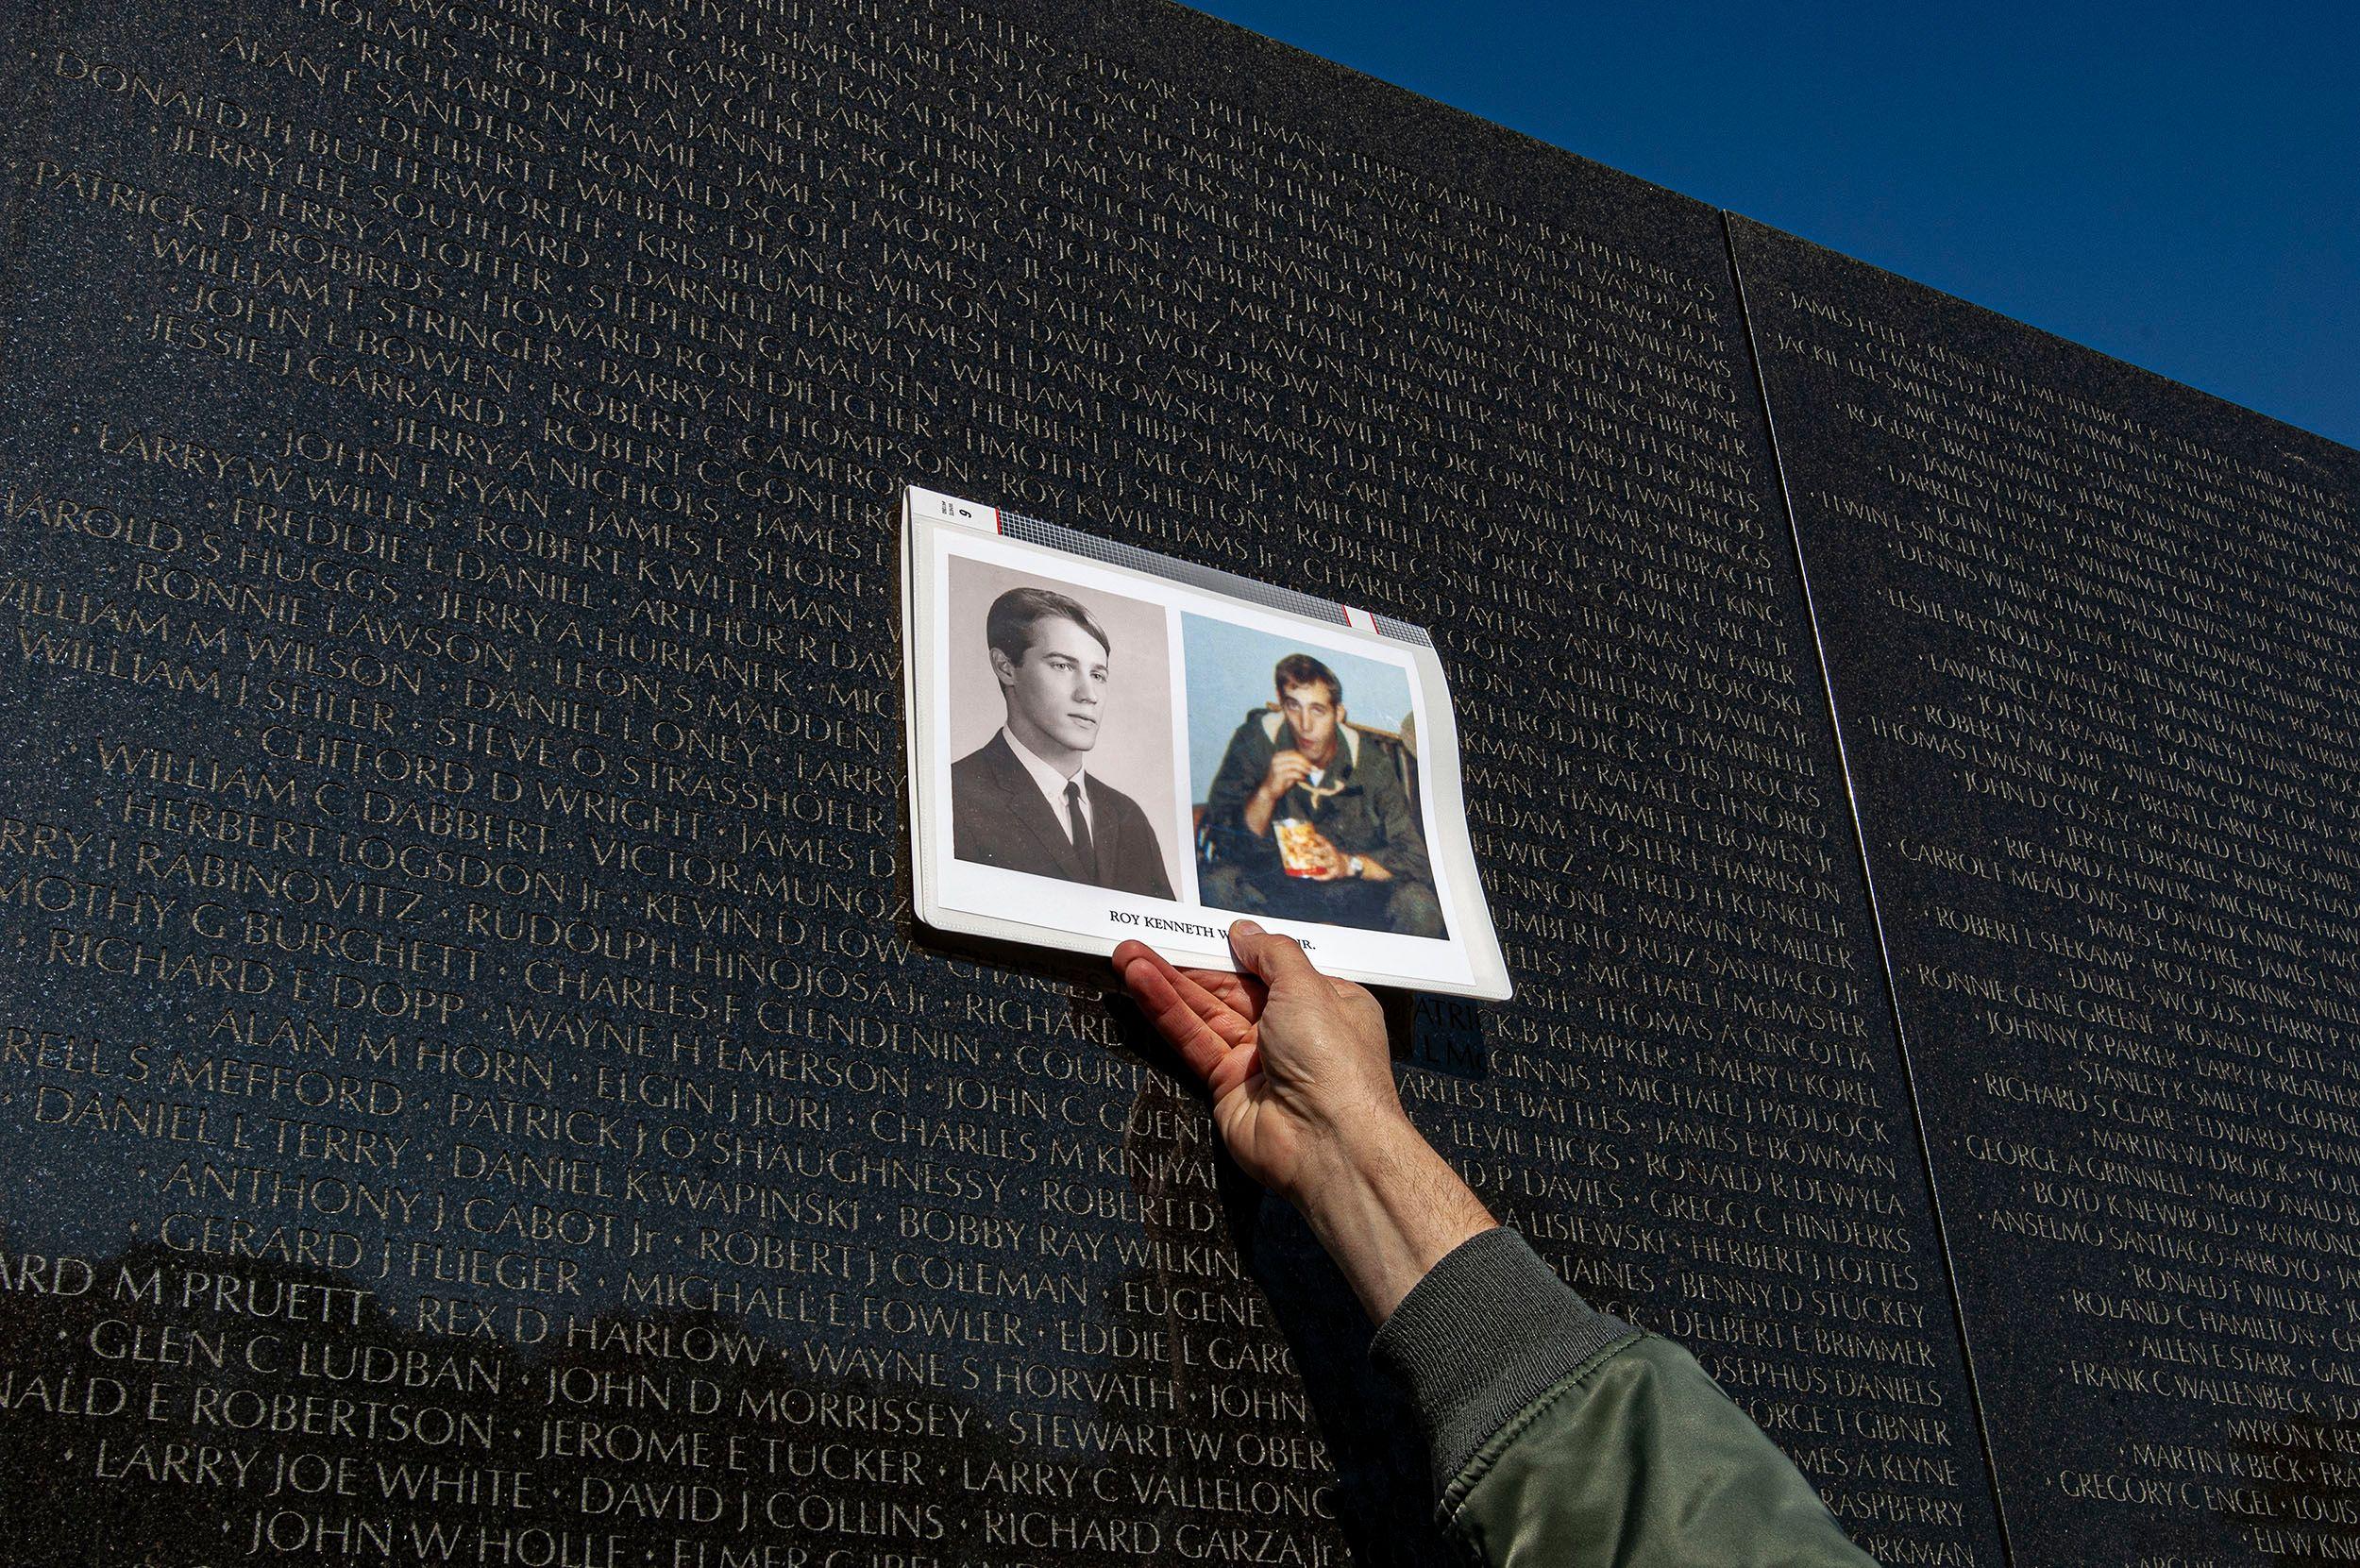 To those who gave the ultimate sacrifice